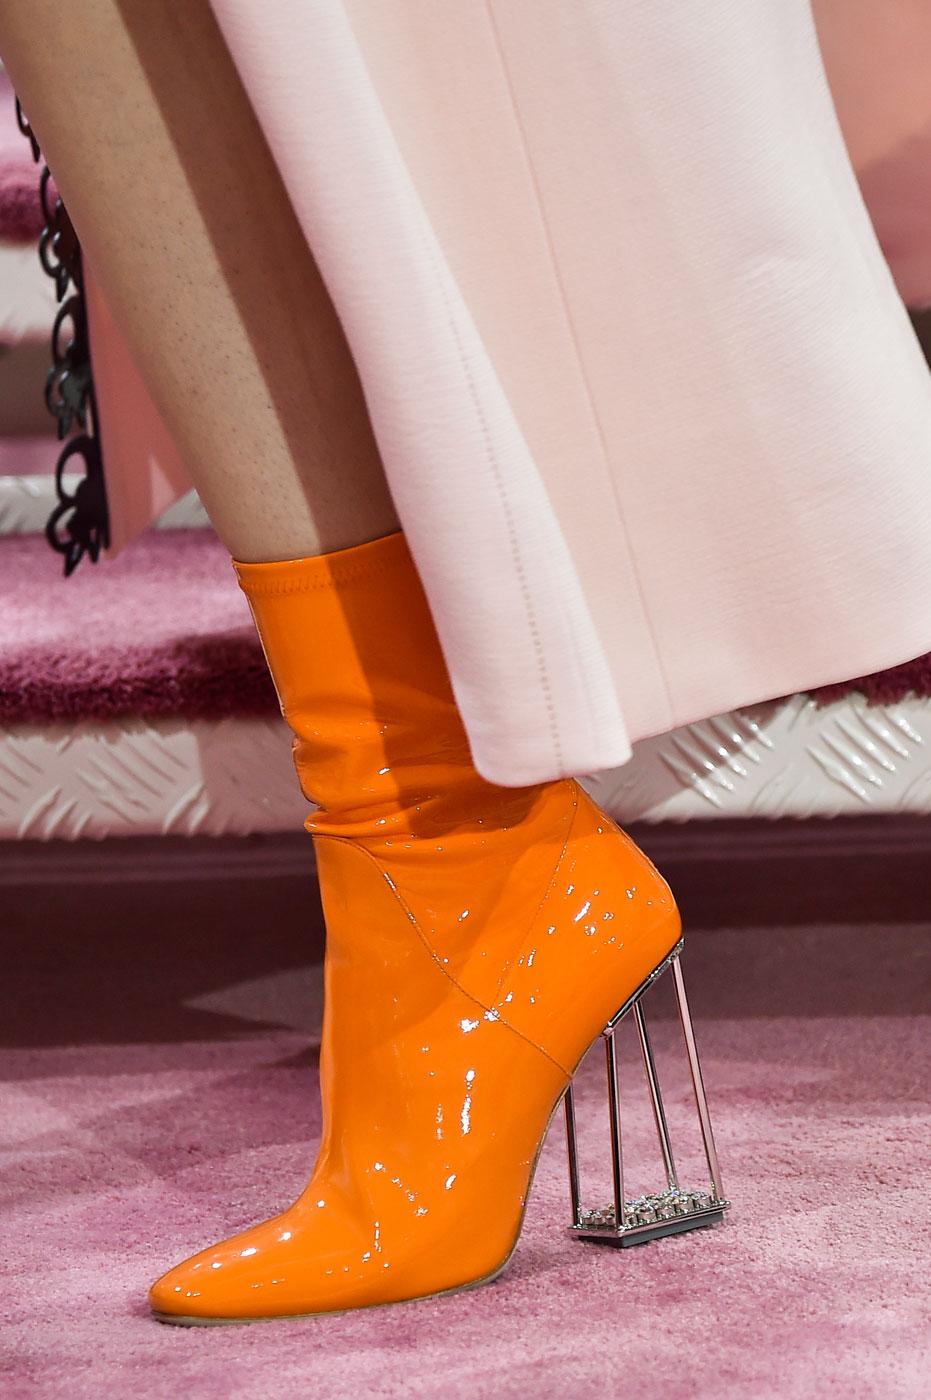 Christian-Dior-fashion-runway-show-close-ups-haute-couture-paris-spring-summer-2015-the-impression-113